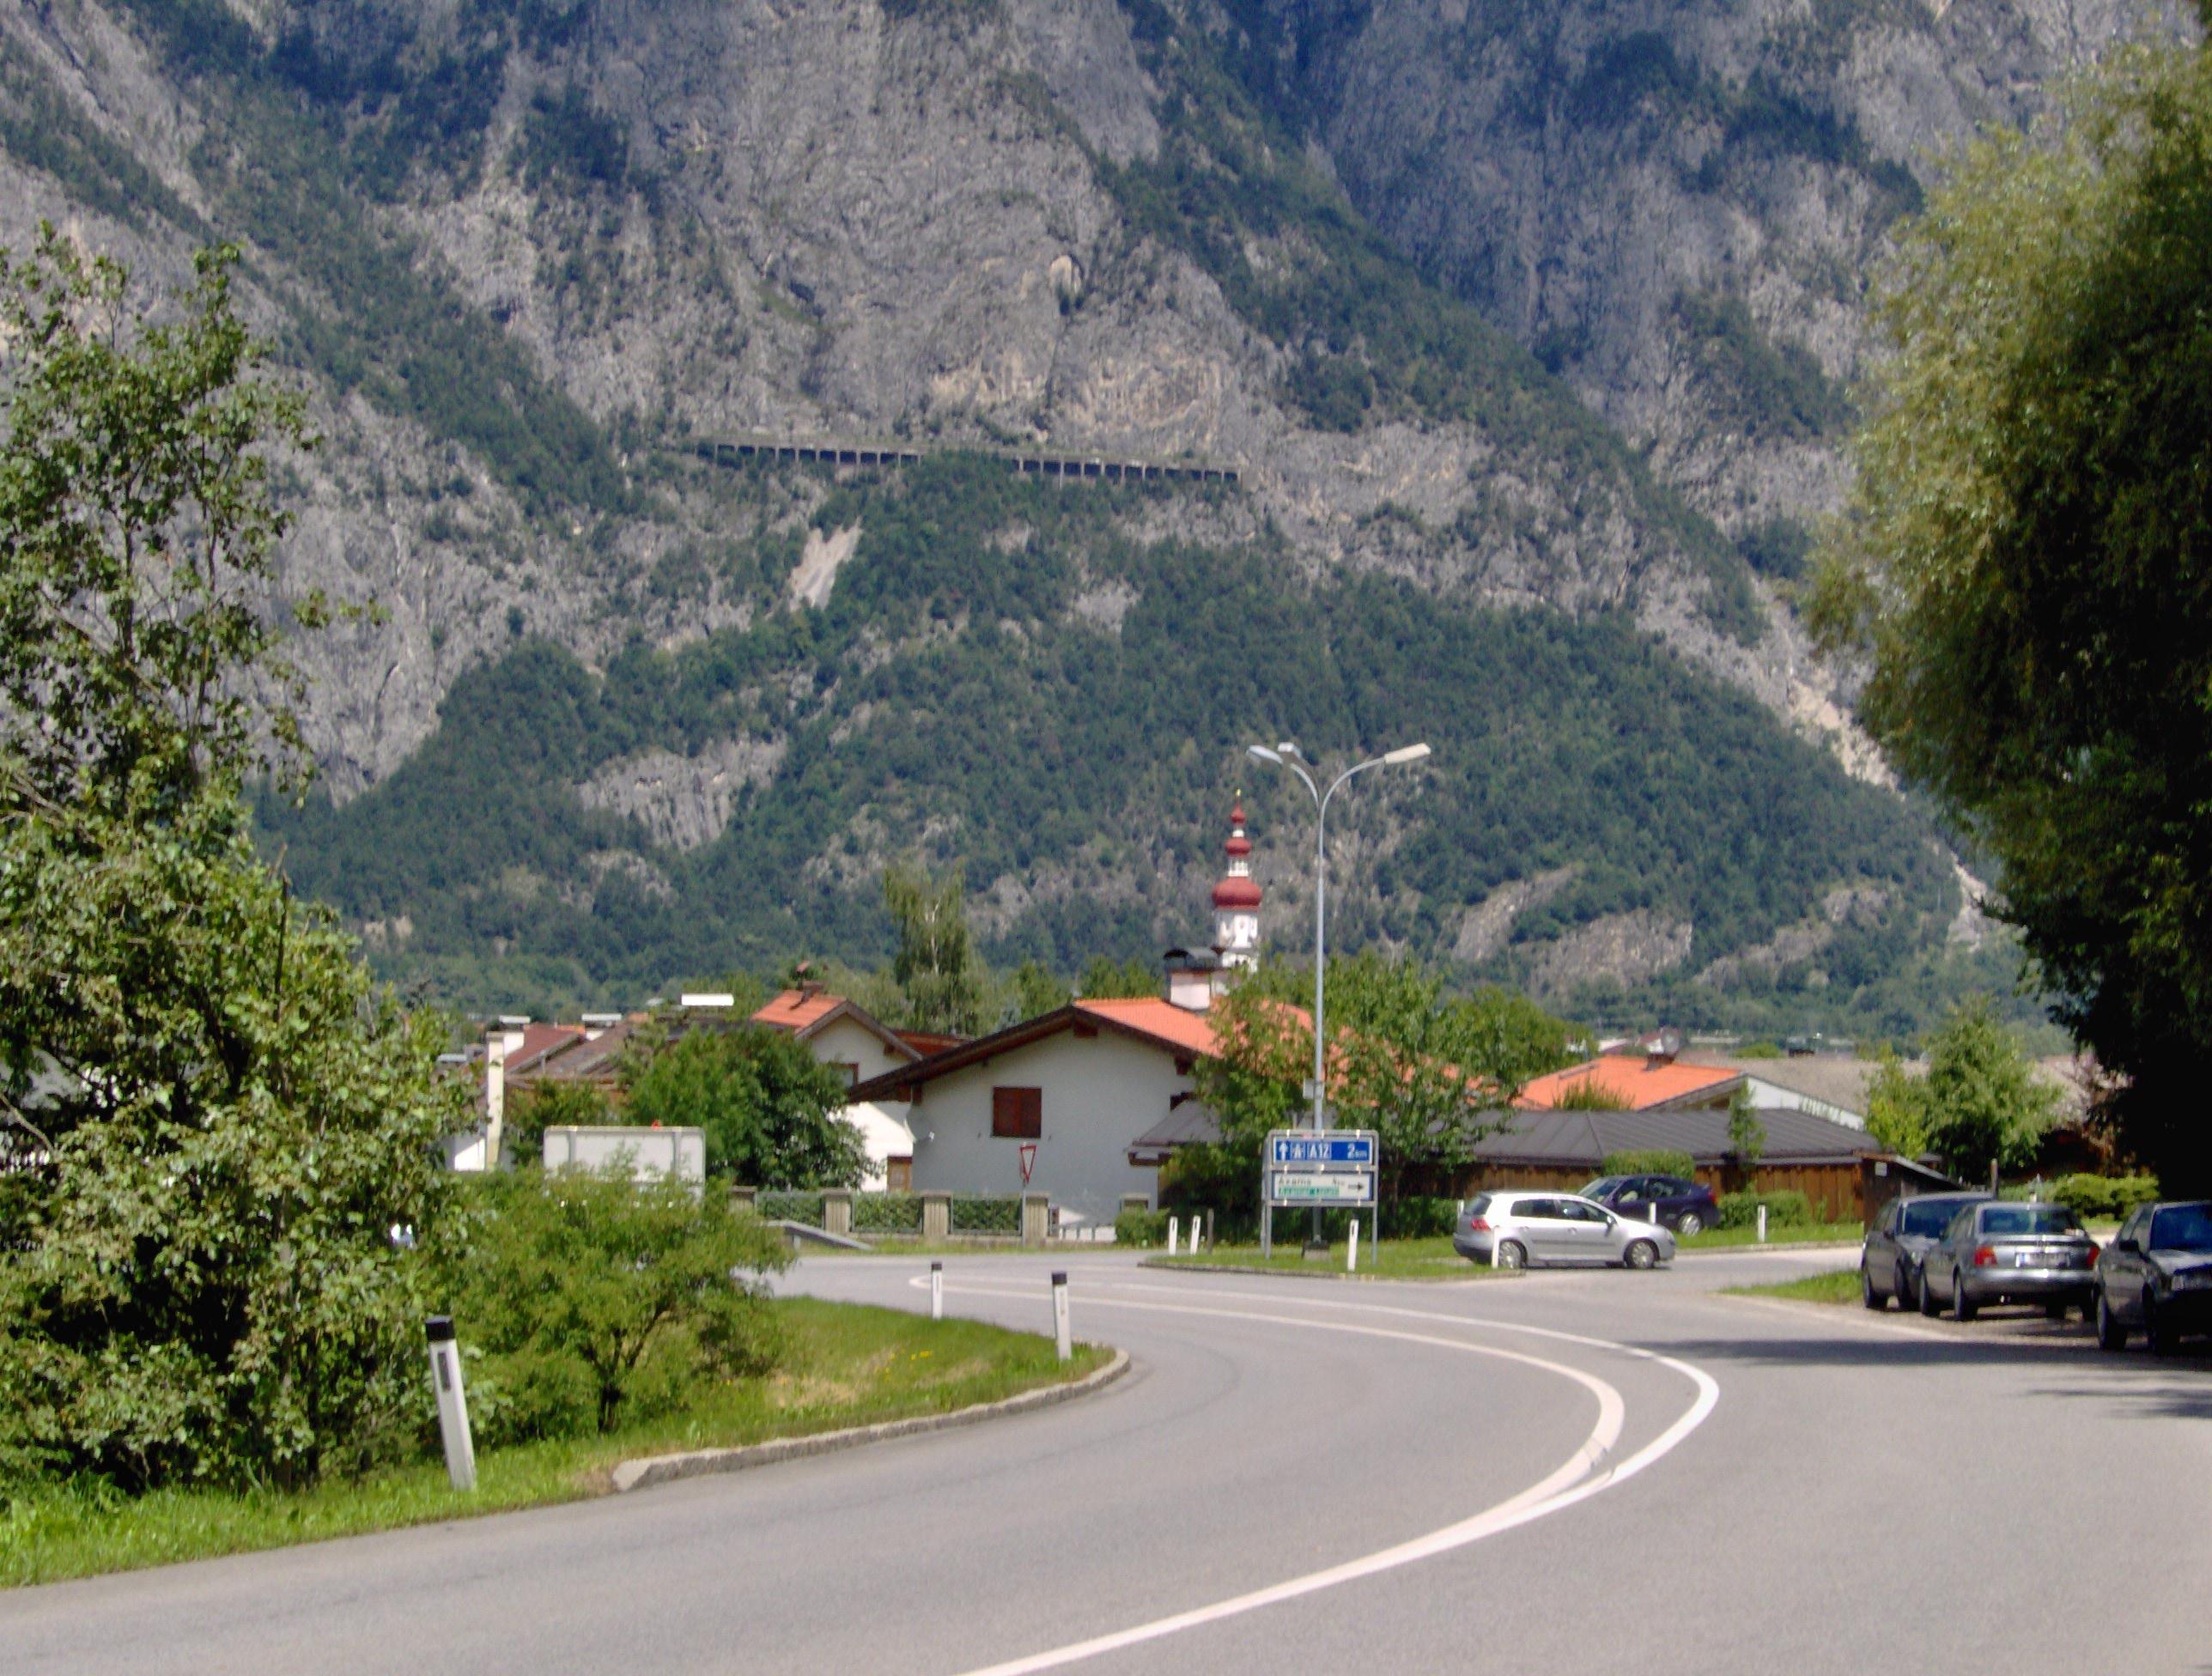 Frau sucht Mann Kematen in Tirol | Locanto Casual Dating